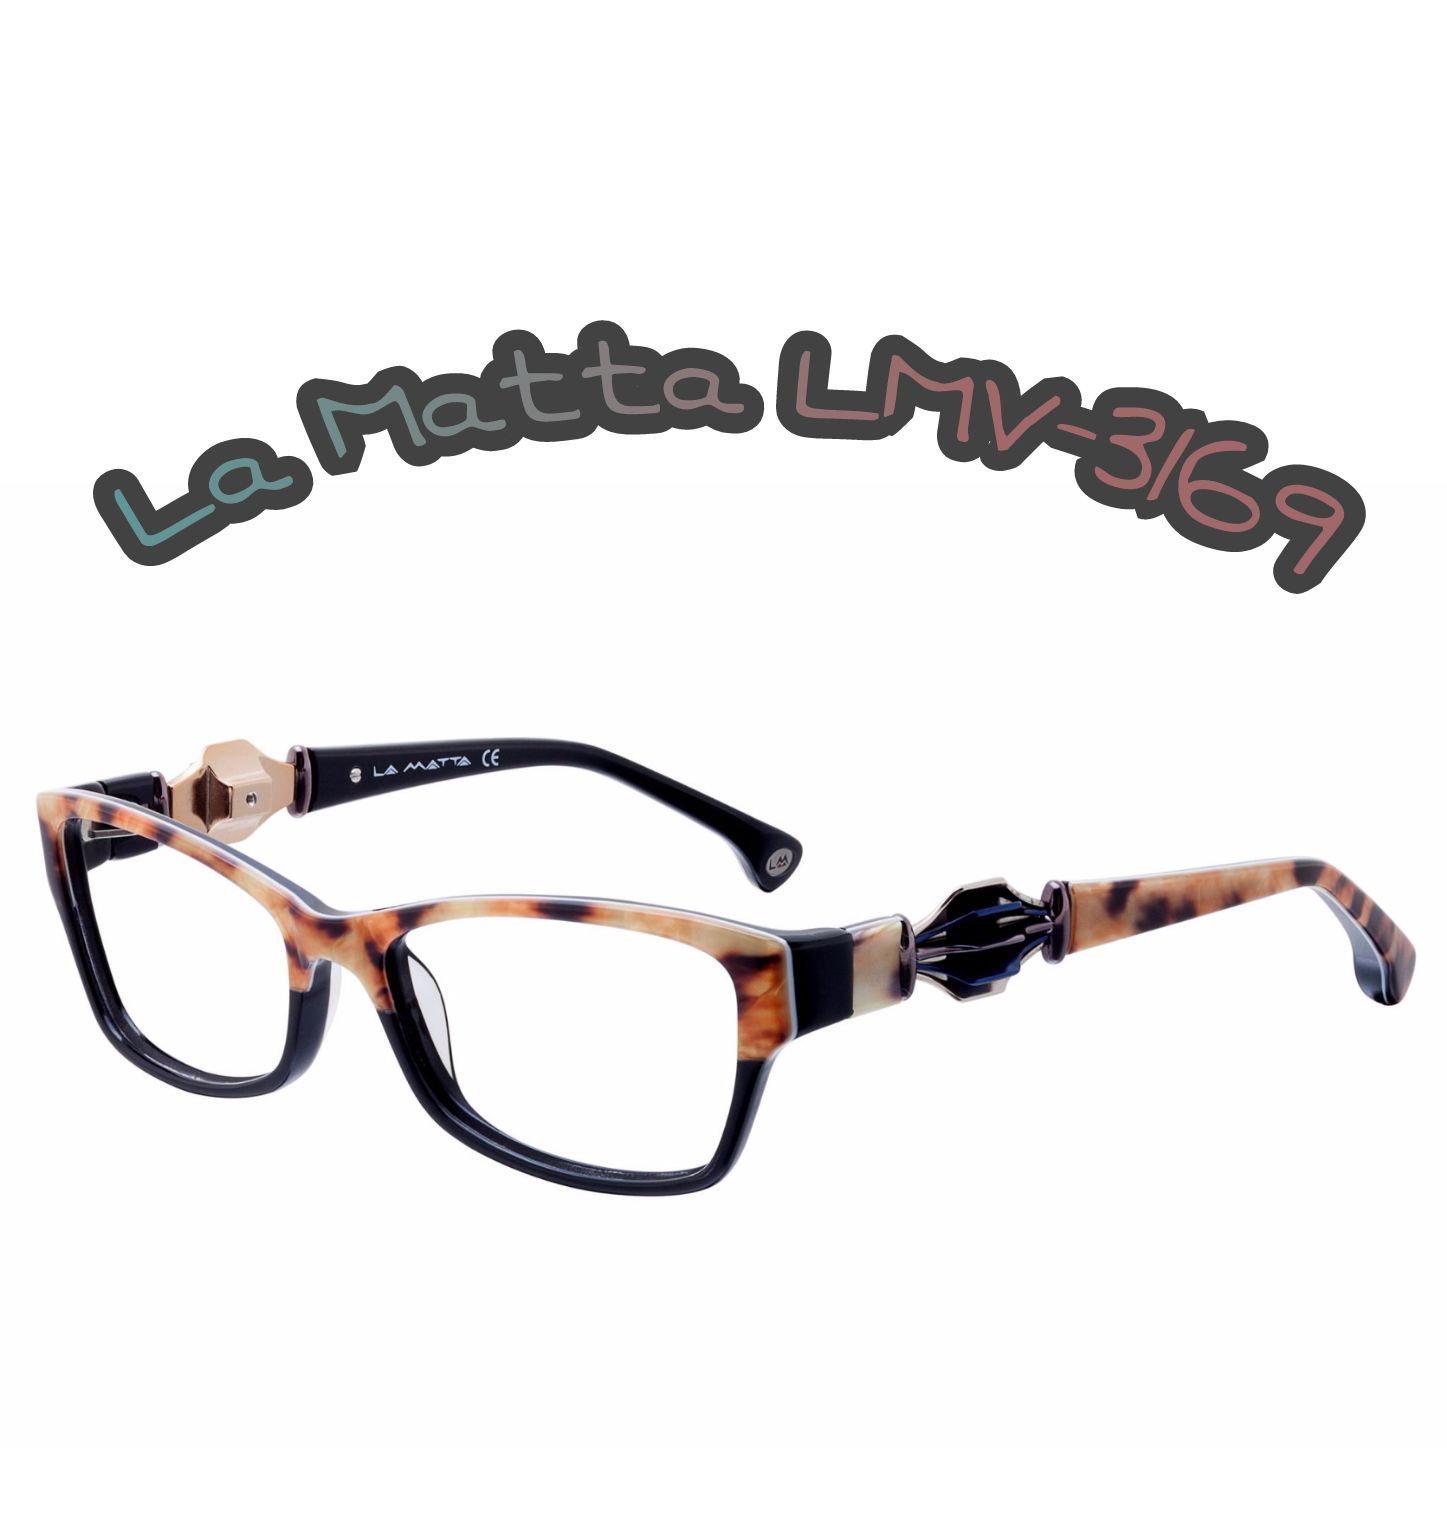 Get a new perspective on life with our opticals 😎🤓 🛍Shop now from www.veneziaorocchiali.com Go n Grab your La Matta LMV-3169 Now! 👆👆 #italy #italy #venezia #oro #occhiali #womenglasses #womeneyewear #womensfashion #womens #lamattaeyewear #lamatta #lamattacapsule #unisexeyeglasses #unisex #unisexeyewear #brandedeyewear #brandedglasses #branded #multicolored #fashionnova #fashion